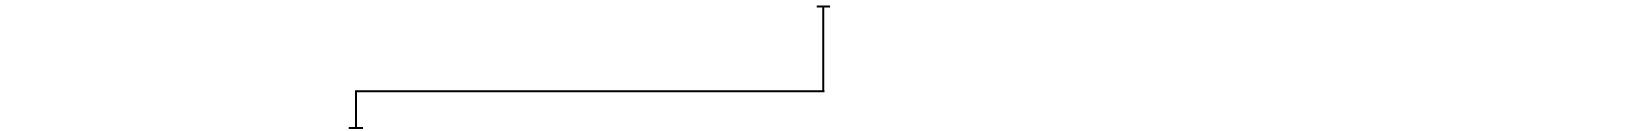 BS001_Squarespace_29.jpg